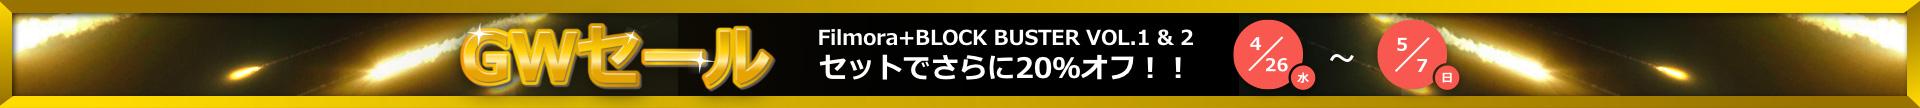 Filmora GWセール・人気VFX素材BlockBusterコレクションが20%OFF!